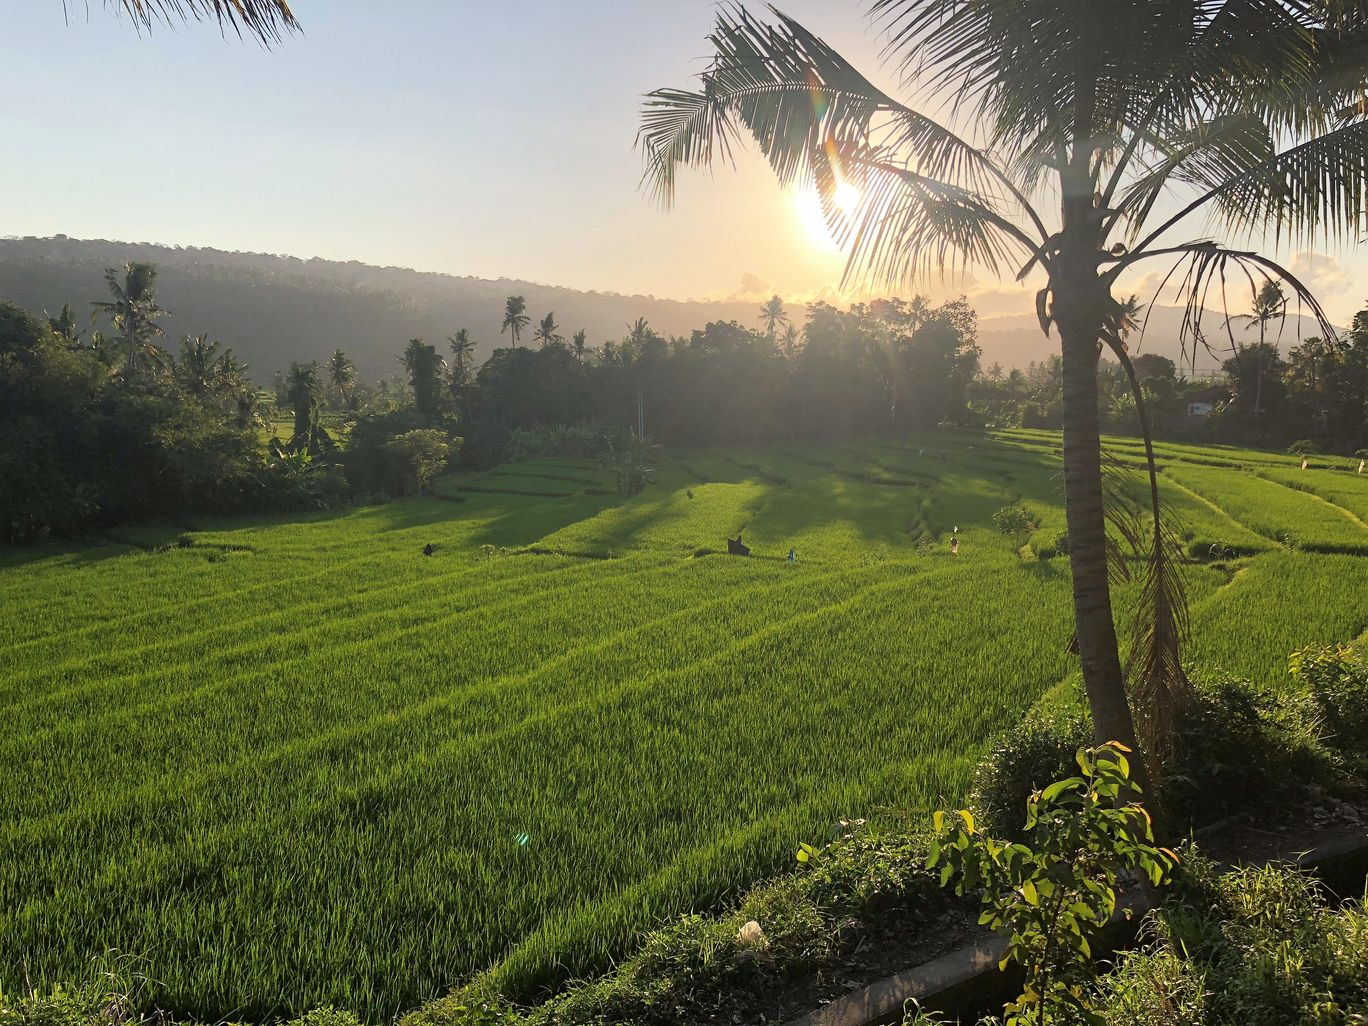 Photo of Tegalalang Rice Terrace By Gunjan Sharma